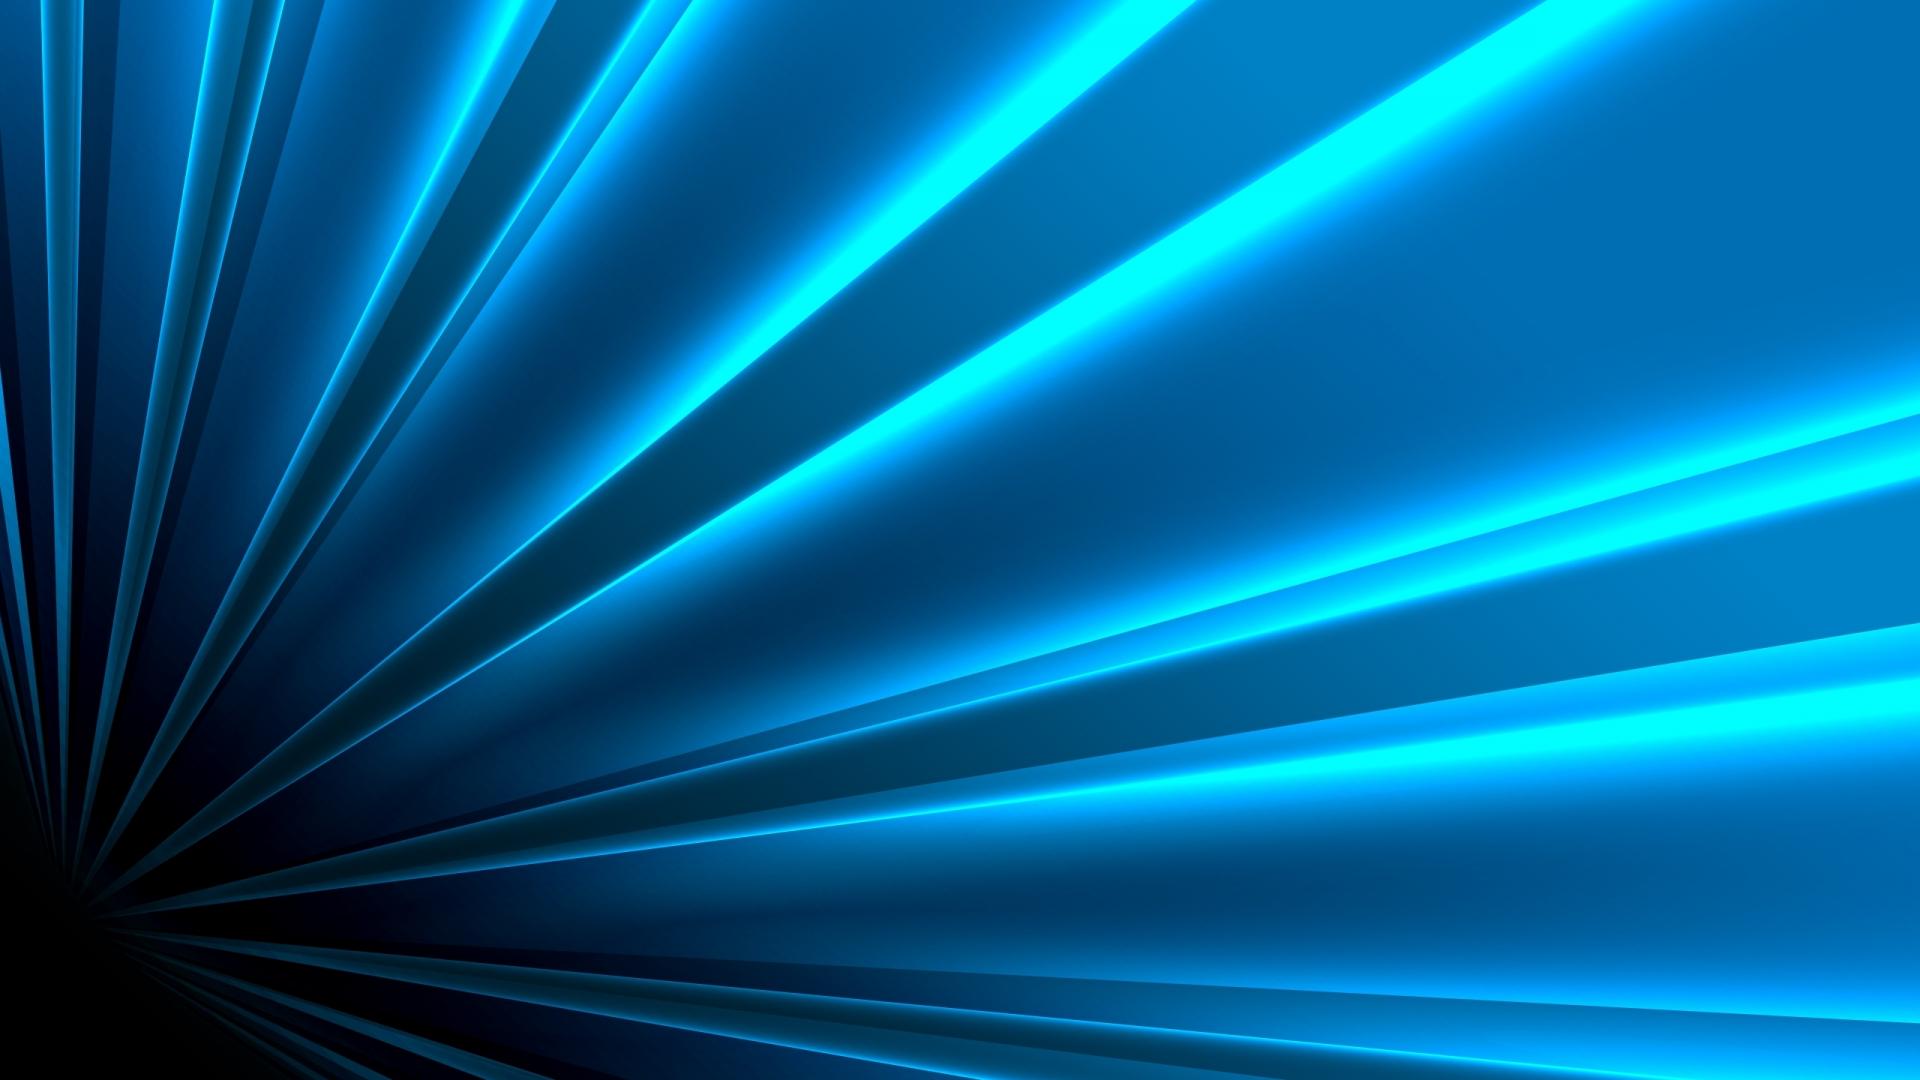 Neon Blue Backgrounds - WallpaperSafari